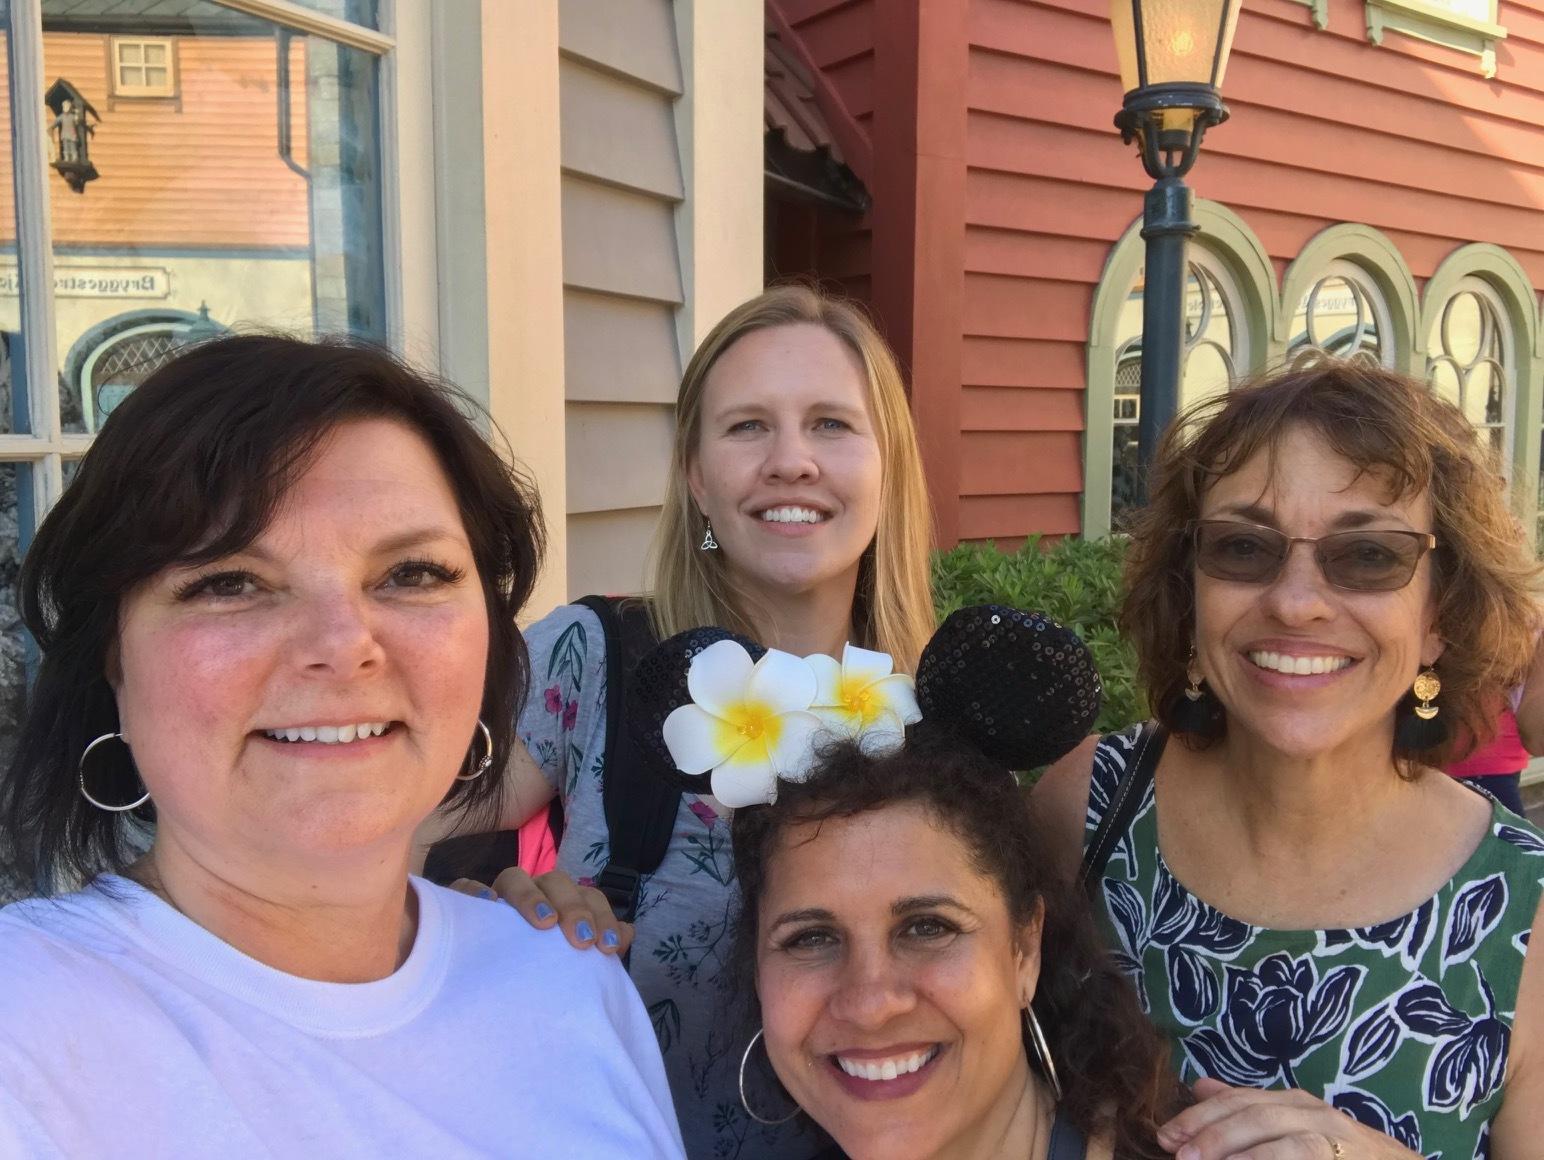 Kim, Andrea, Cheryl and Cindy at Epcot